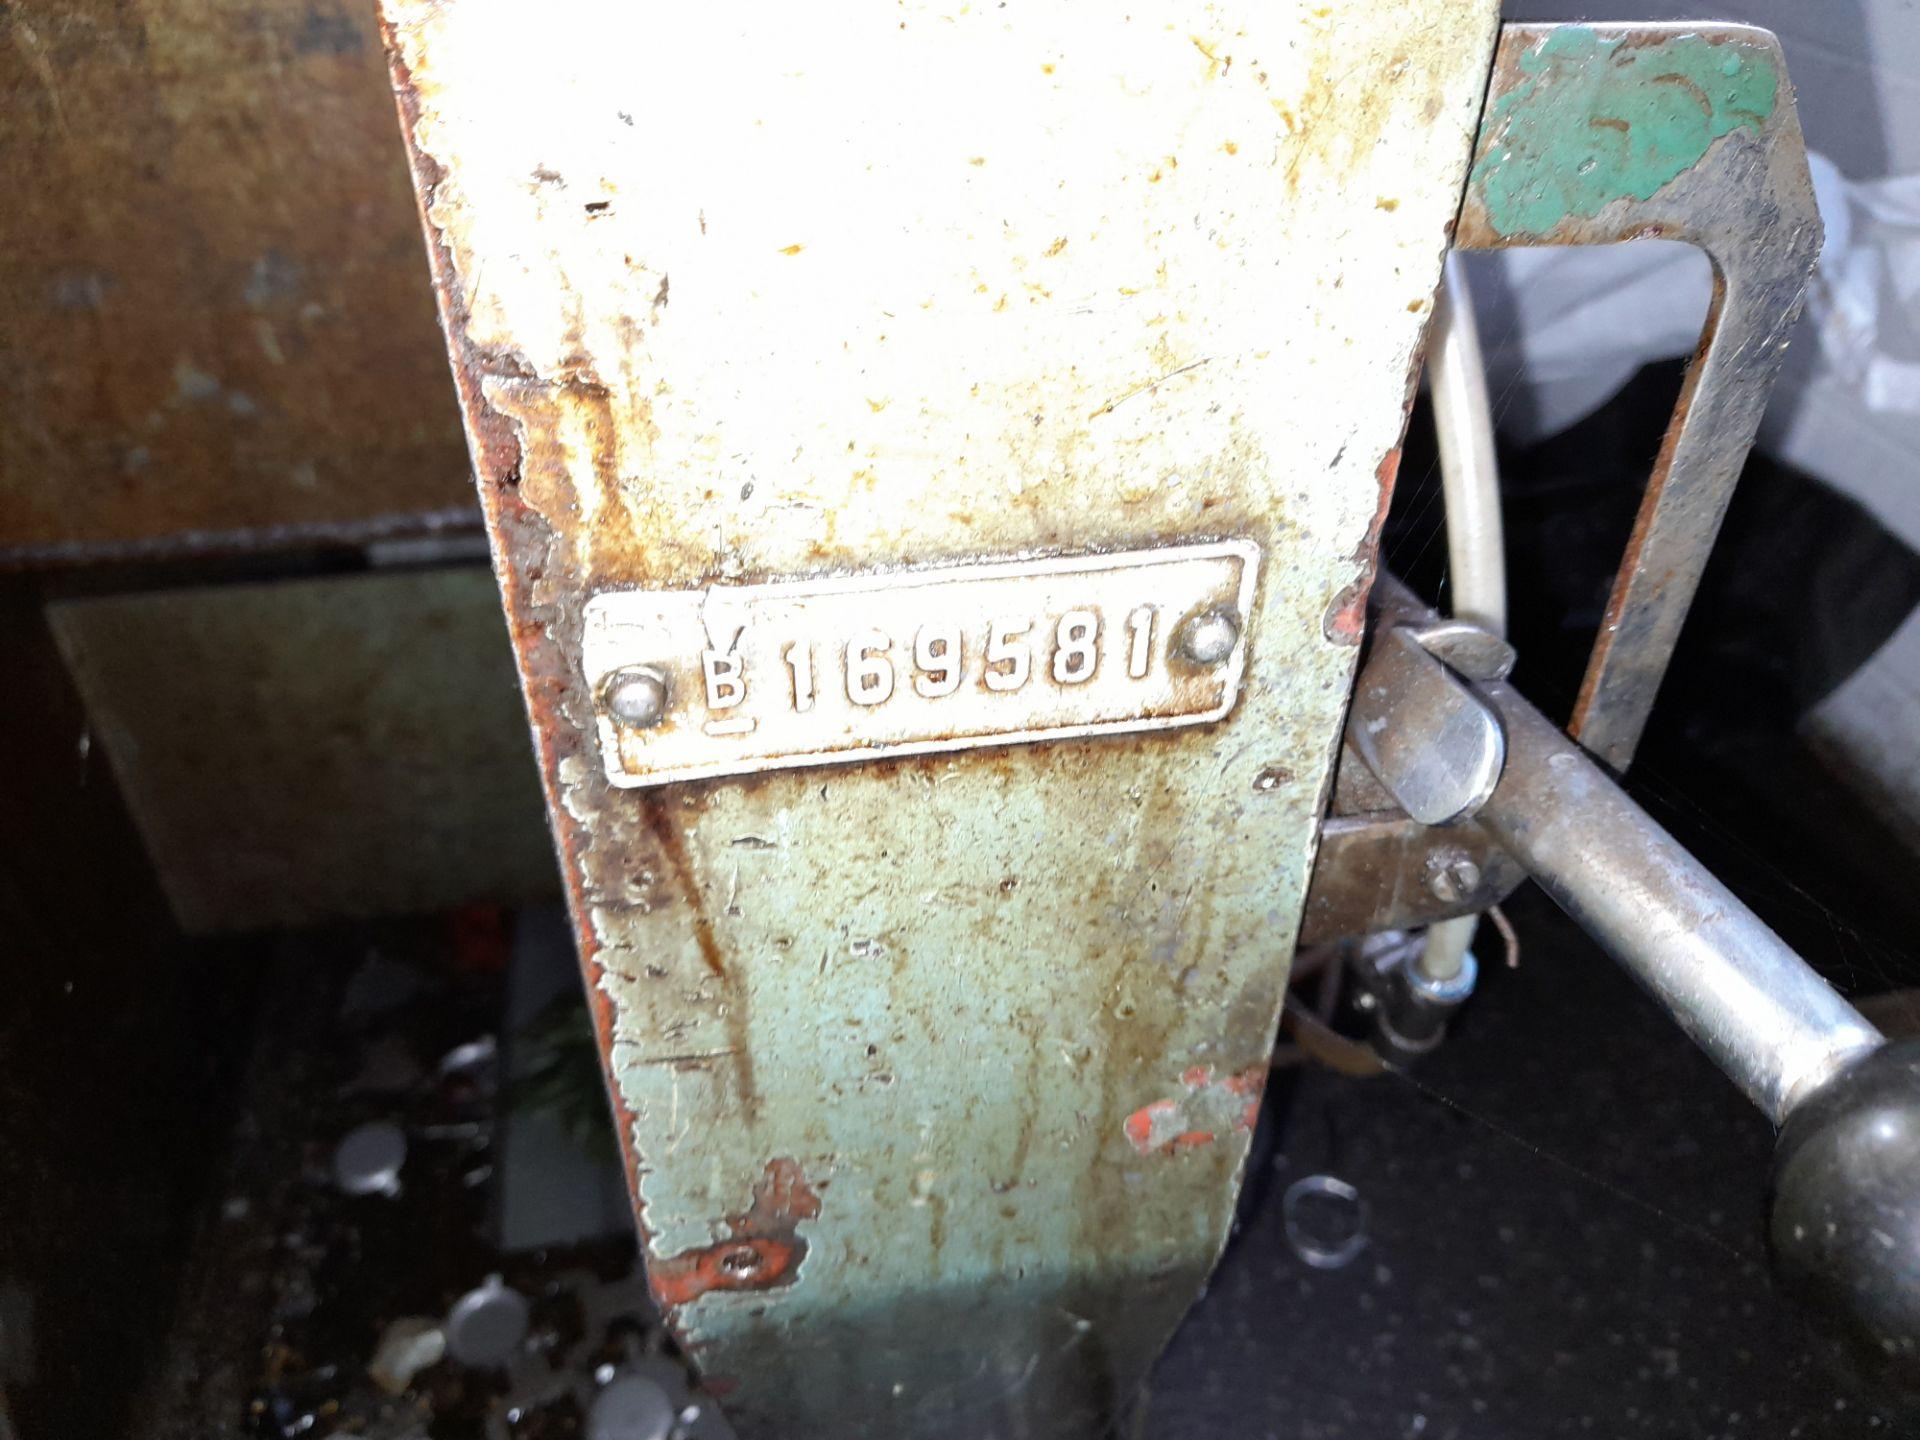 Norton Hydraulic Down Stroking Press, S/n B169581 - Image 4 of 5